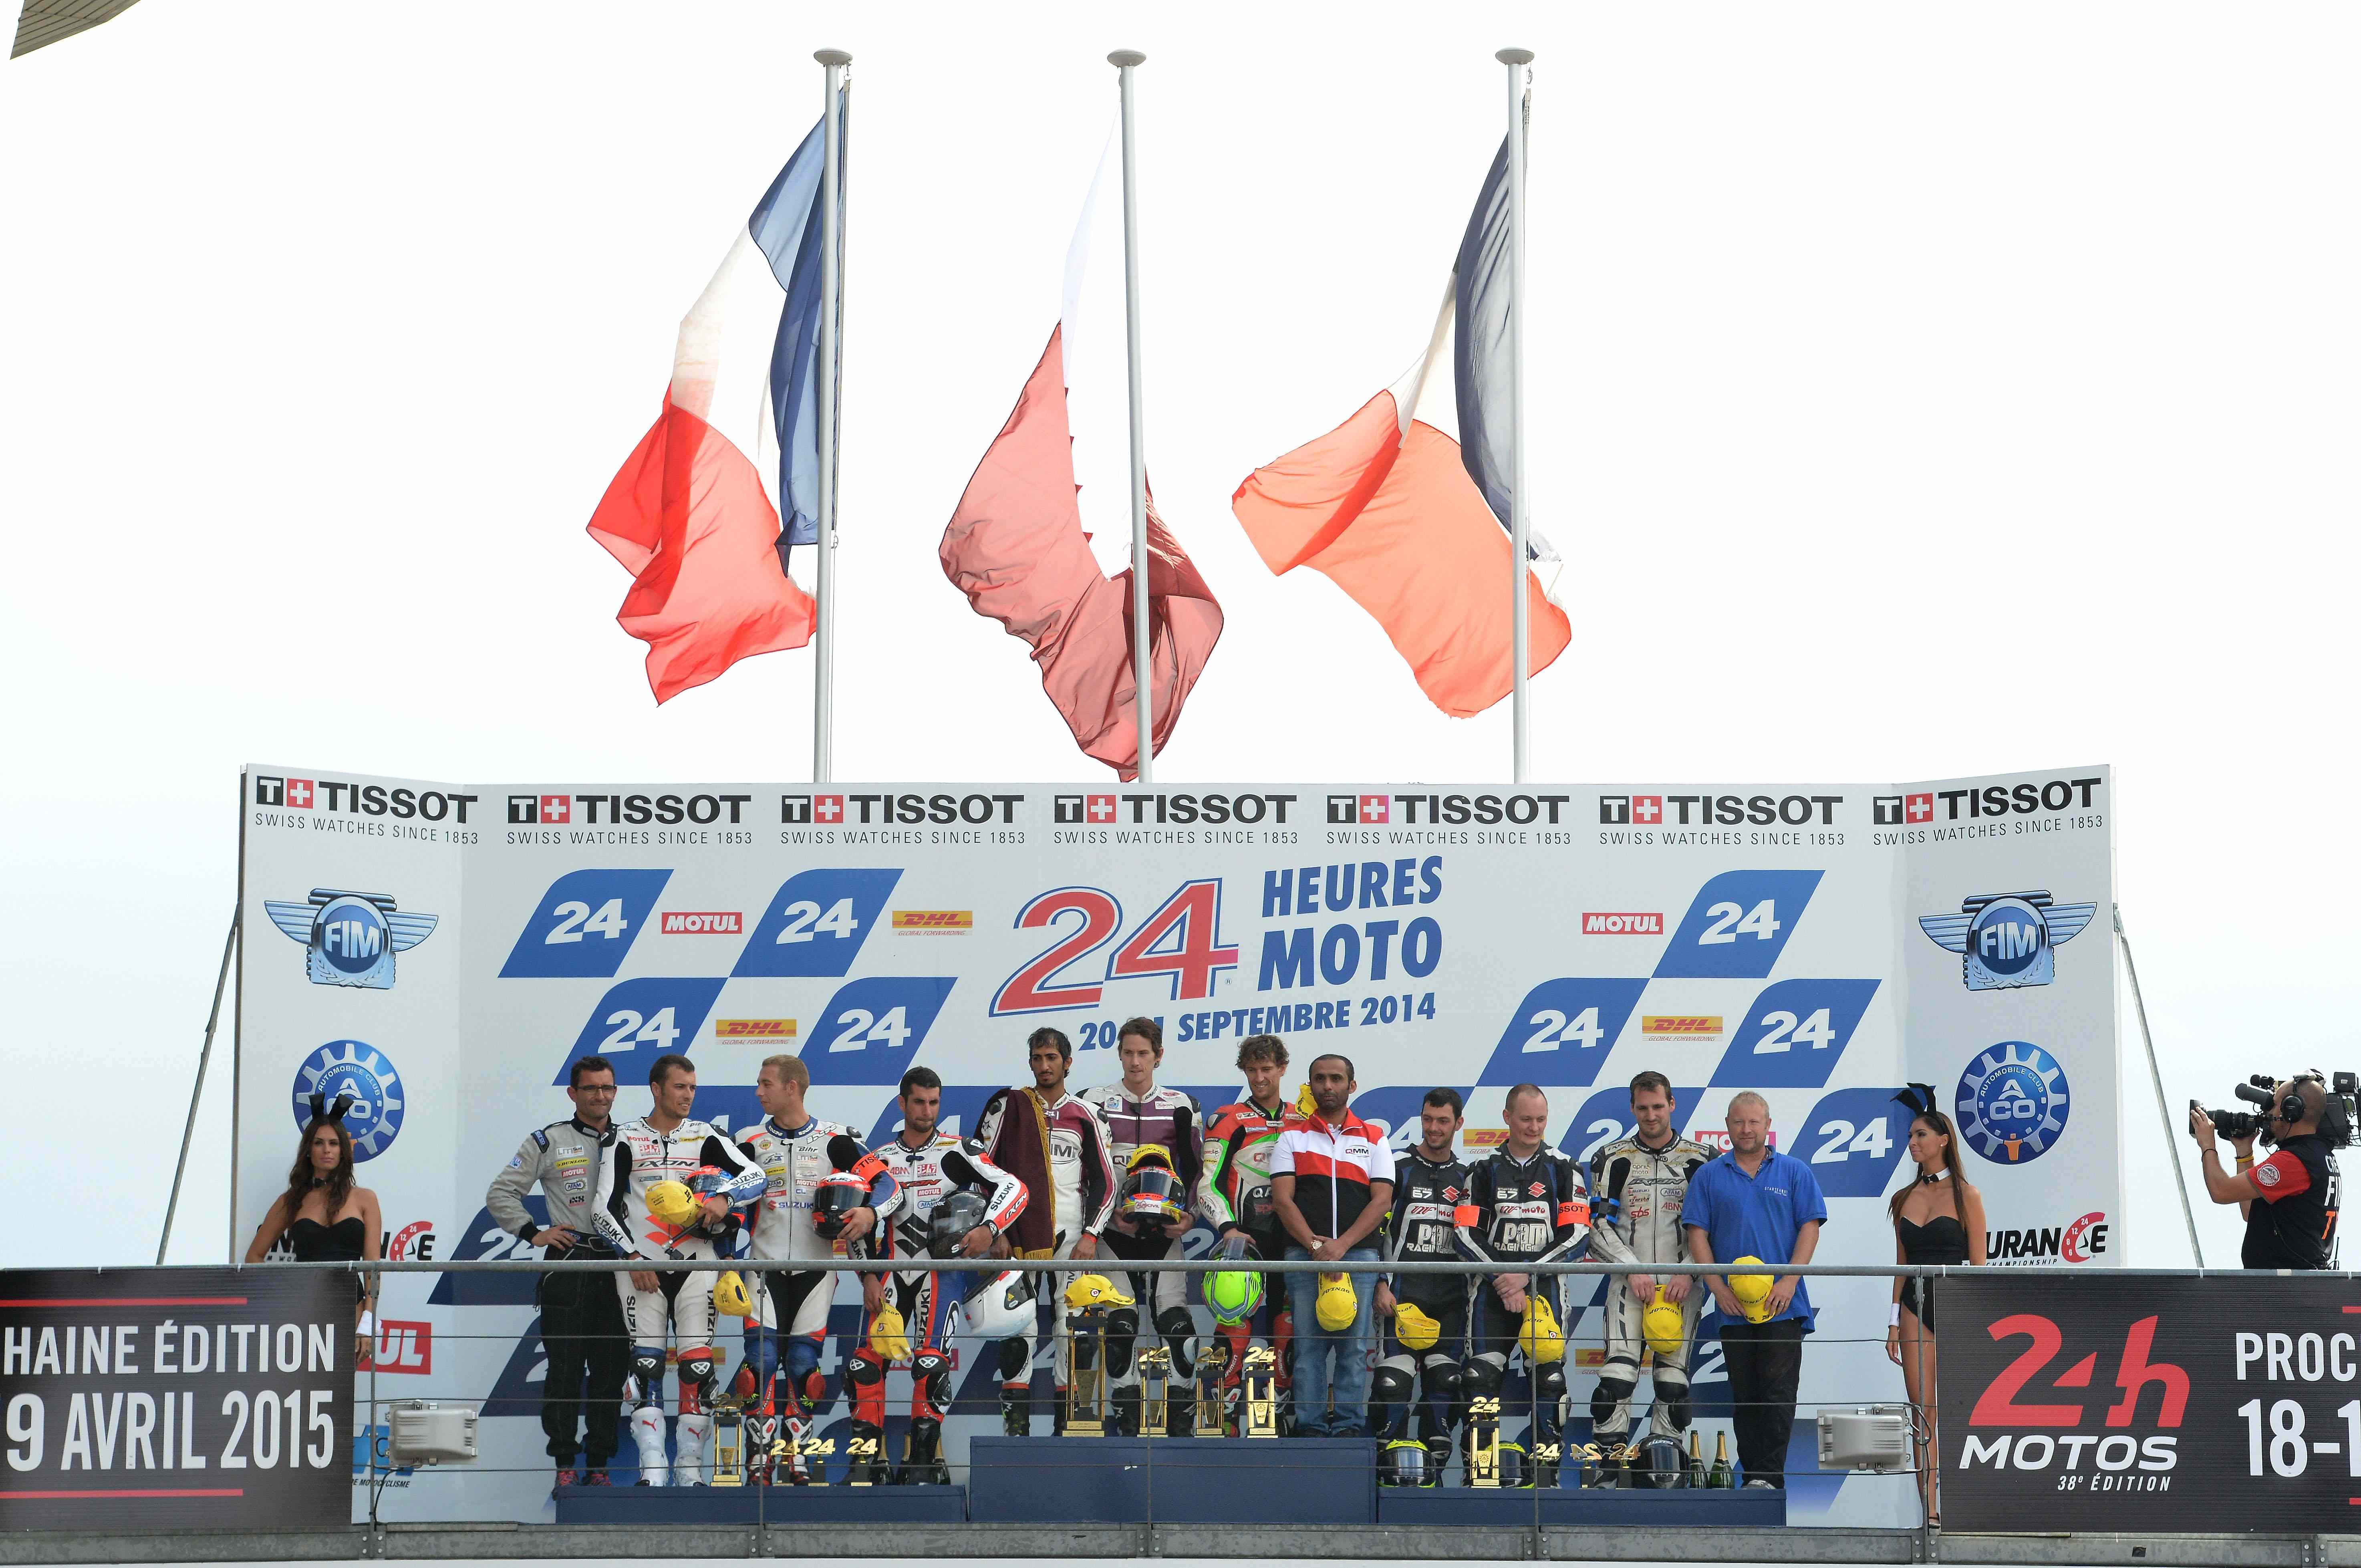 Bikes: Qatar Endurance Racing Team achieve Supersport class victory at 24H Moto Le Mans